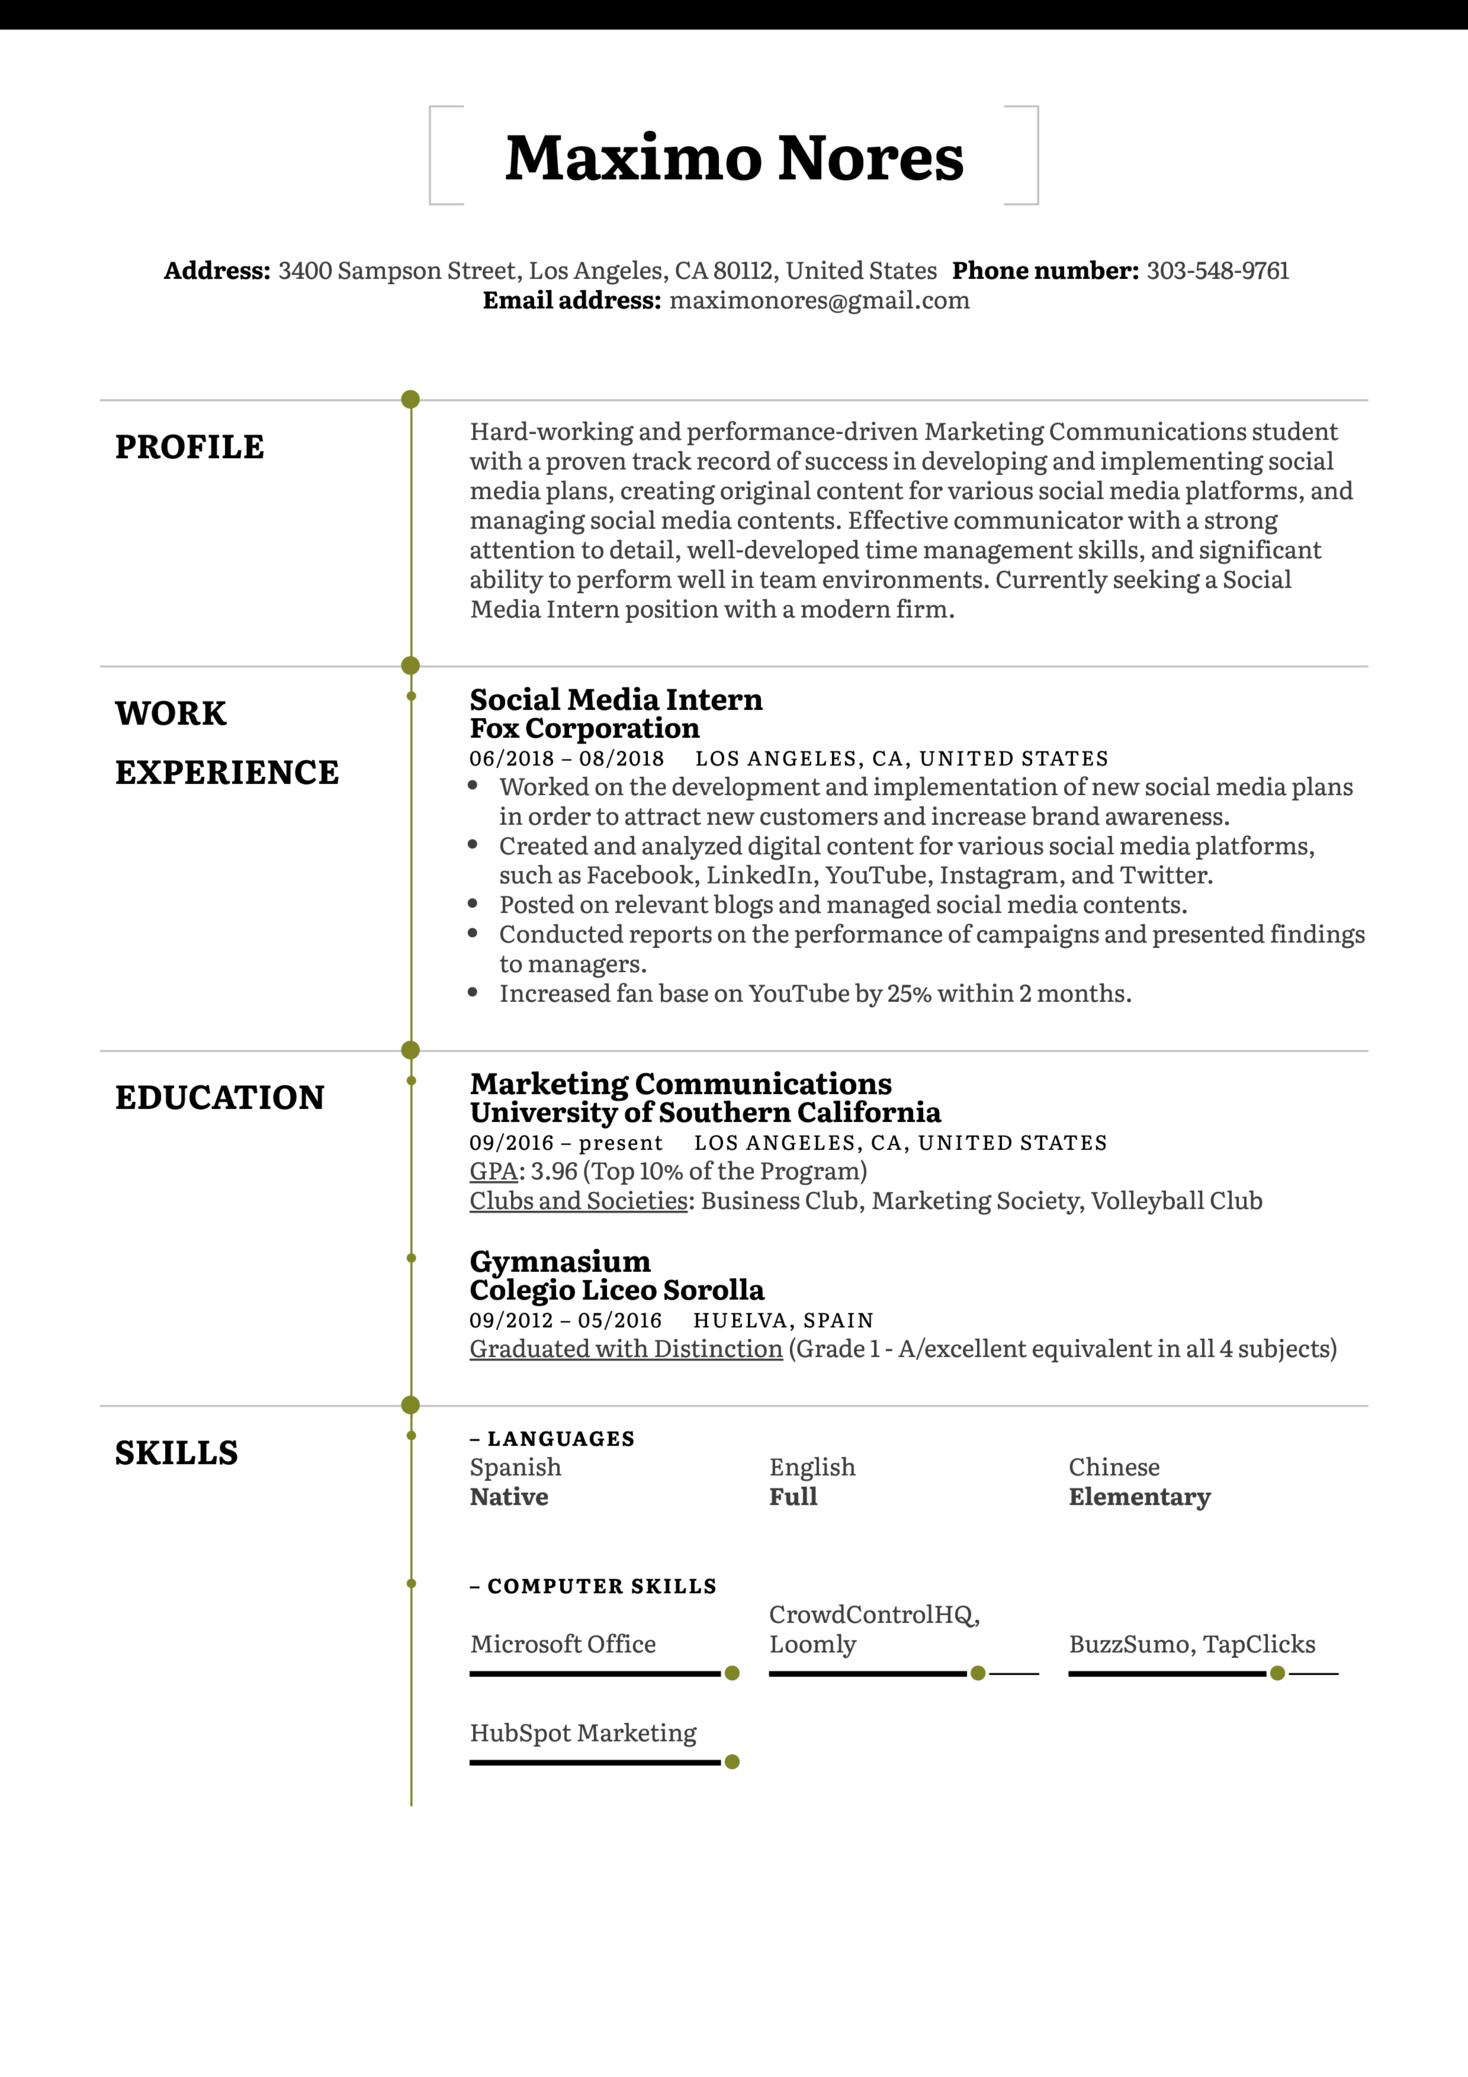 Social Media Intern Resume Example (Parte 1)